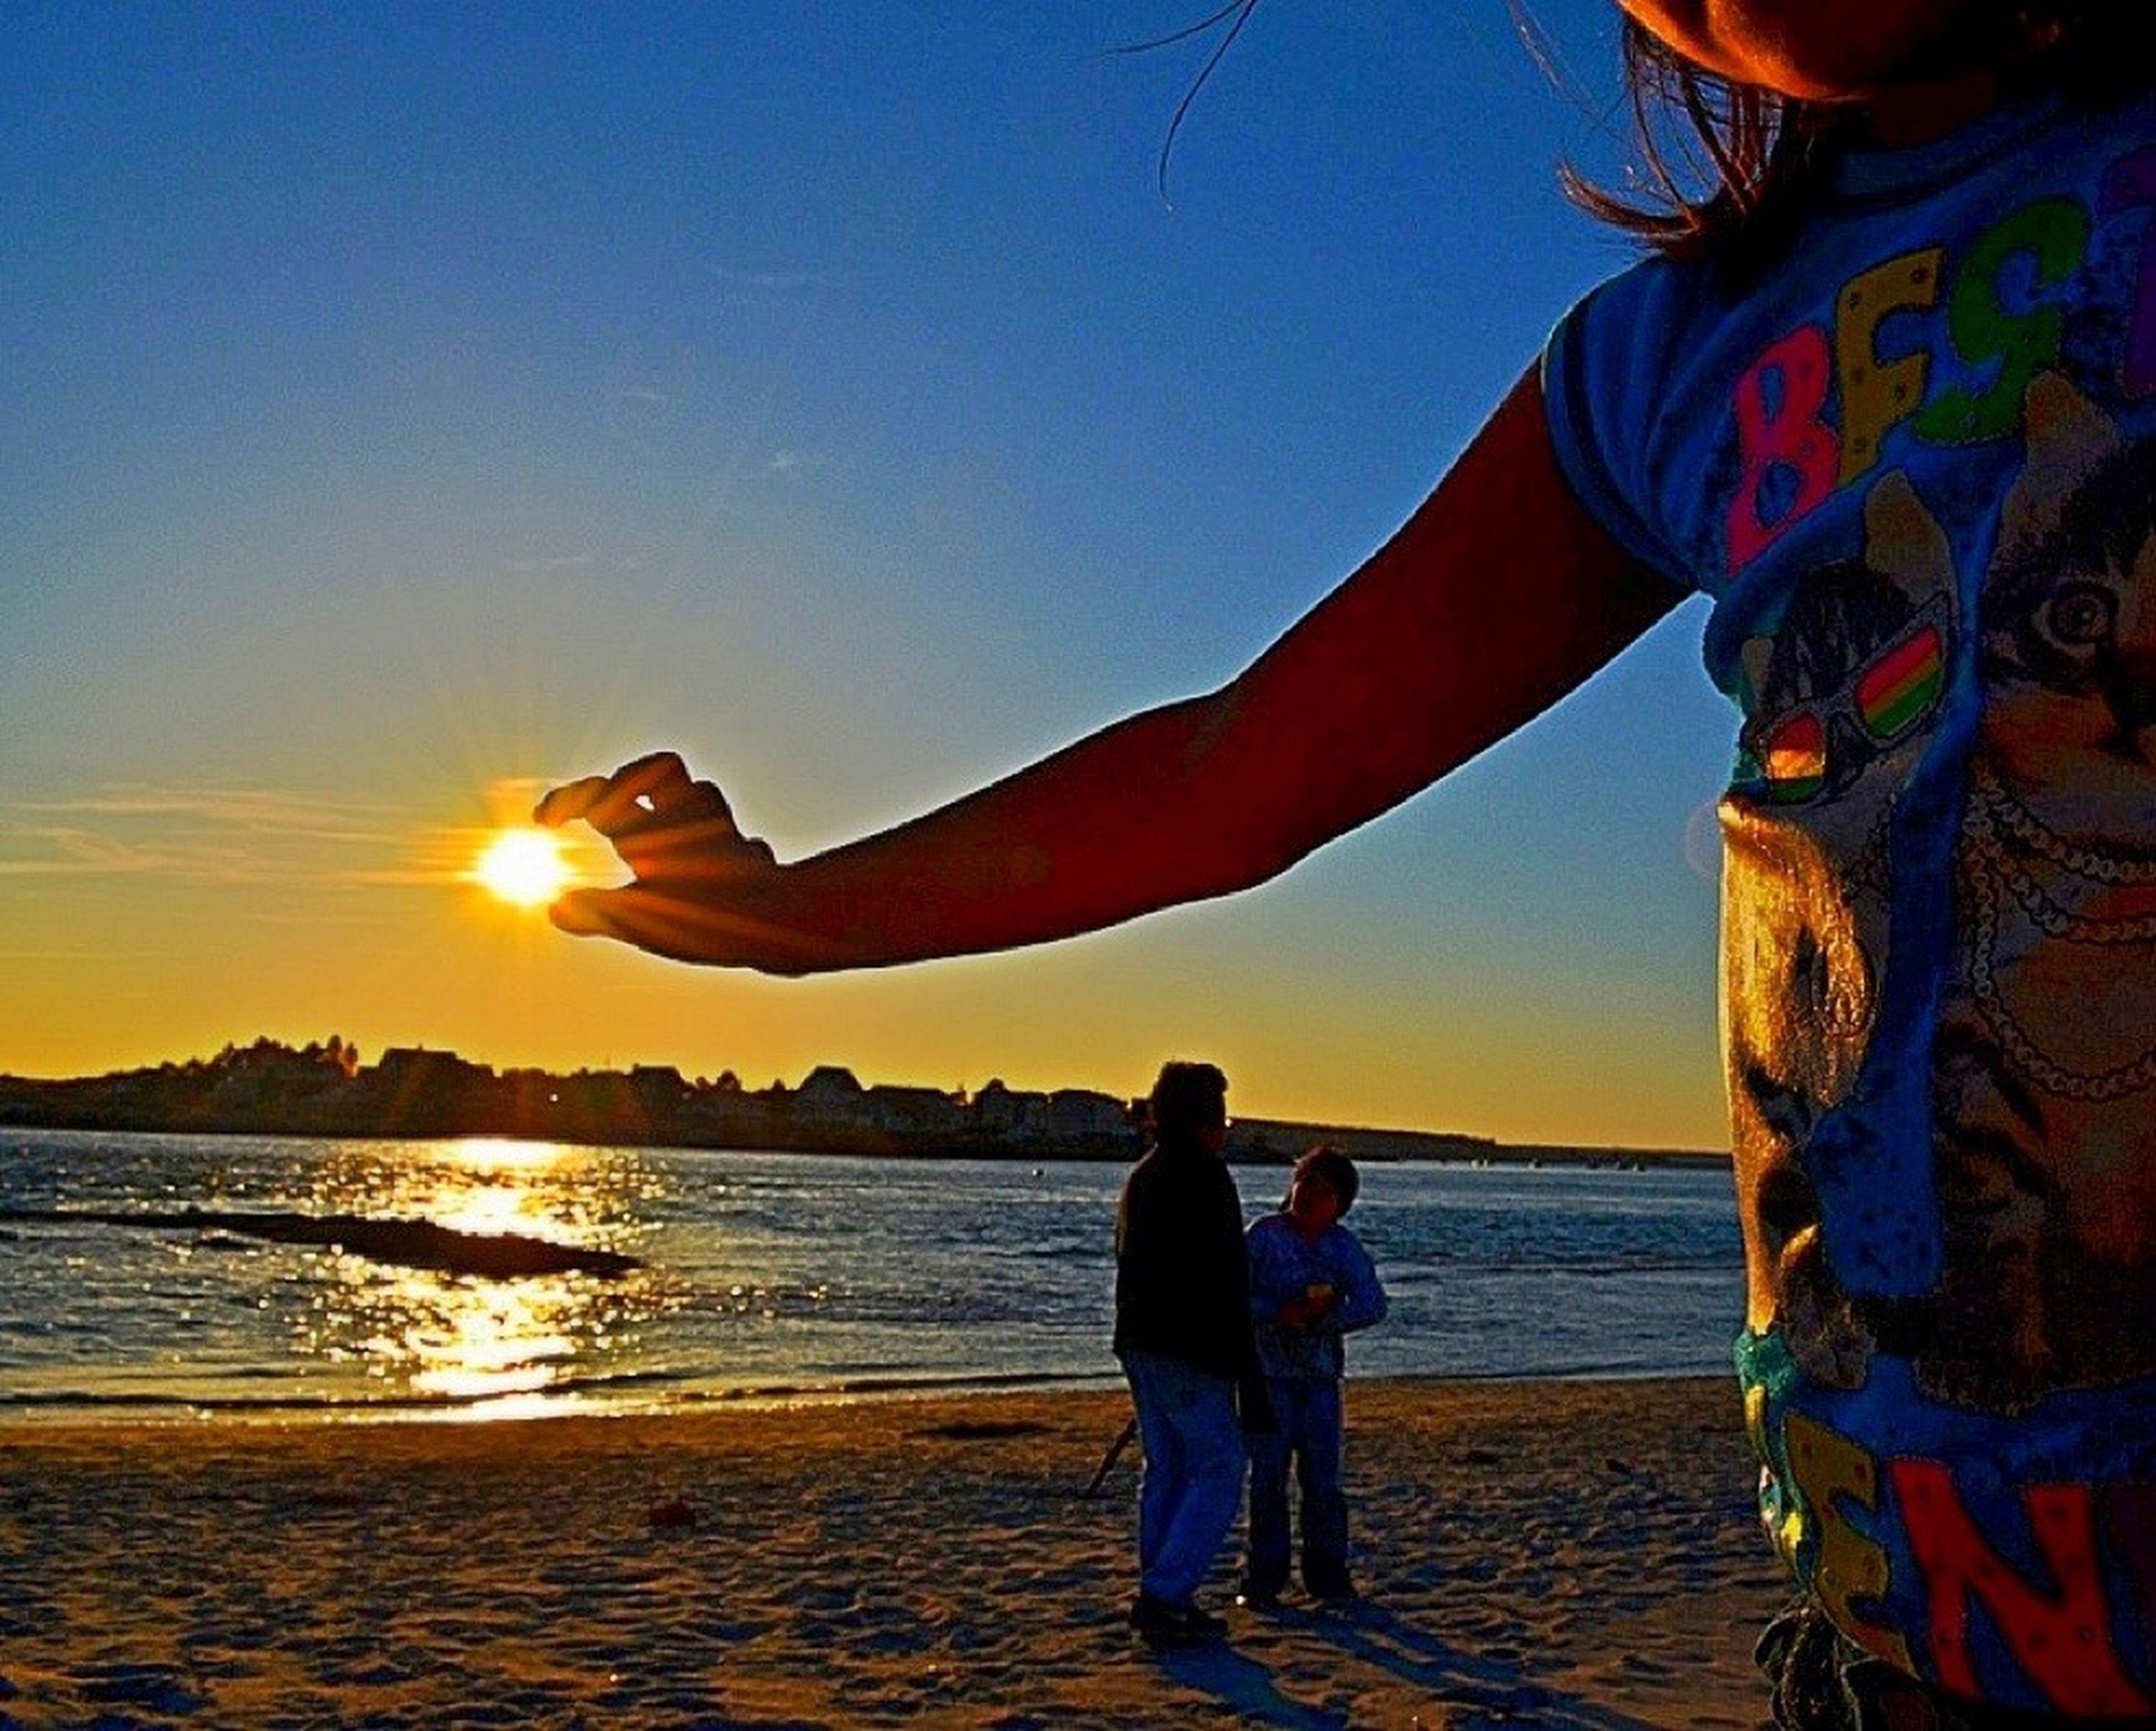 sea, beach, sunset, water, lifestyles, leisure activity, shore, sun, vacations, sand, sky, horizon over water, scenics, tourist, sunlight, person, tranquility